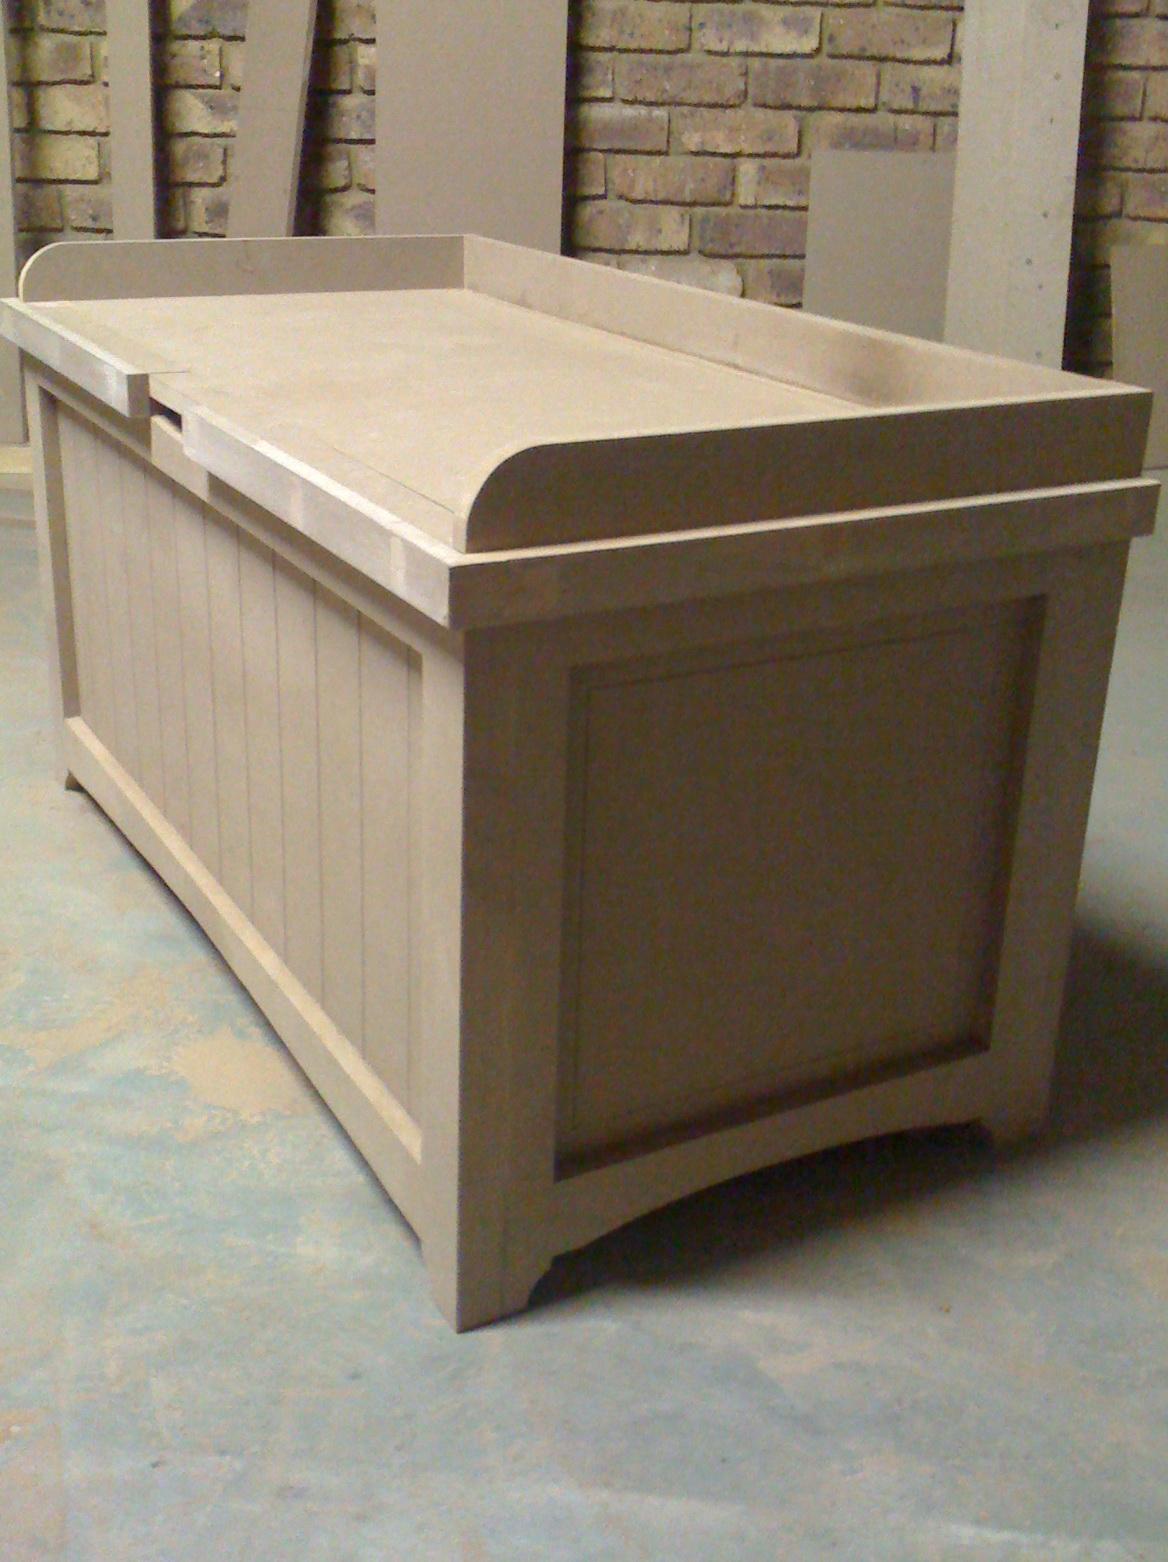 Toy Box Bench Seat